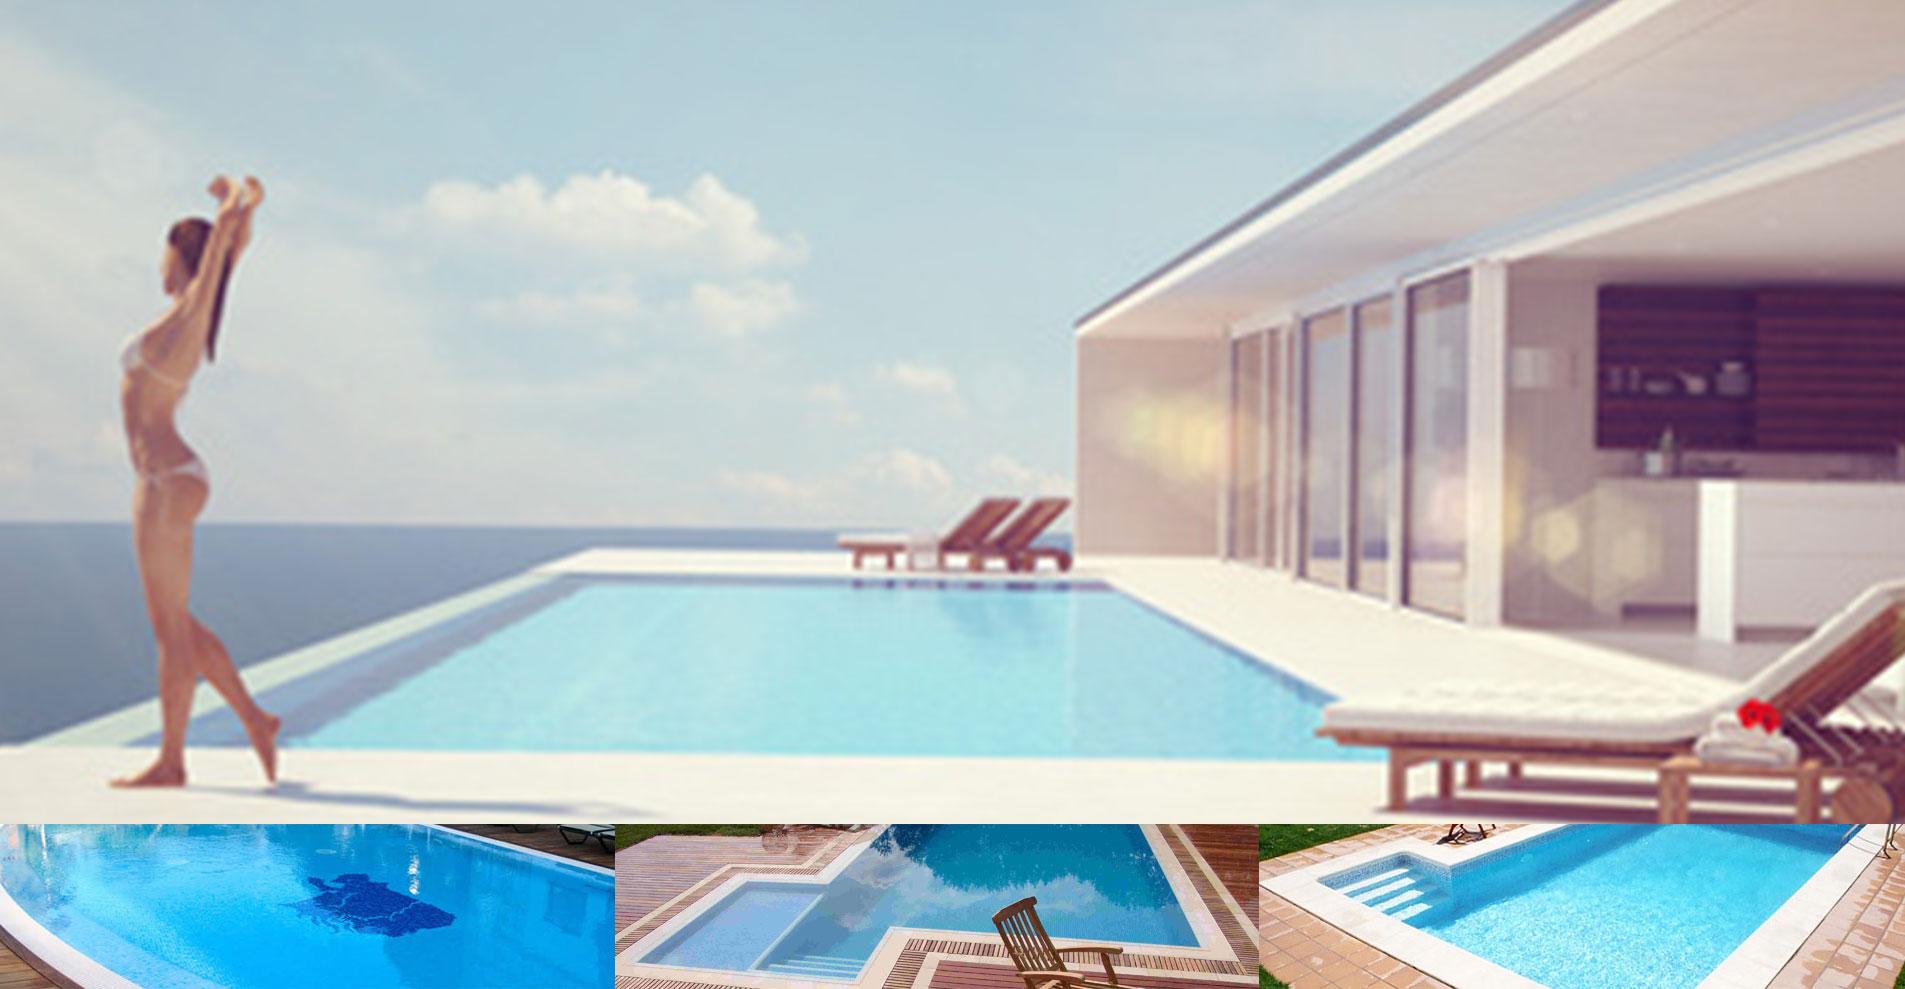 Oferta piscina 8x4 - Precio piscina obra 8x4 ...